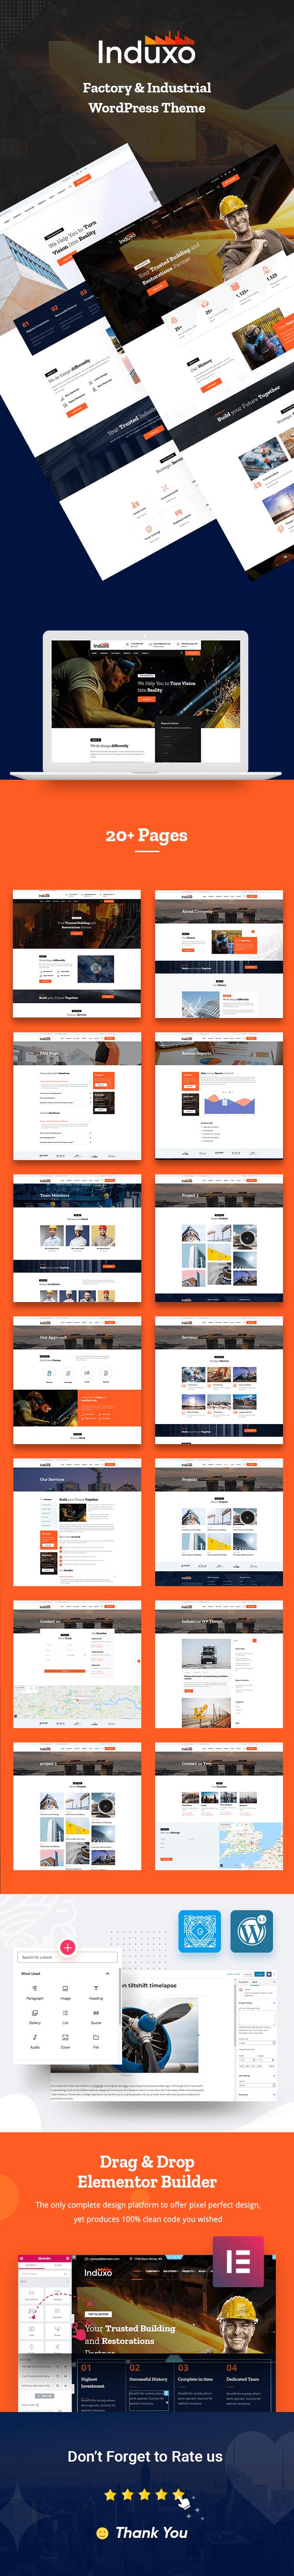 Induxo WordPress